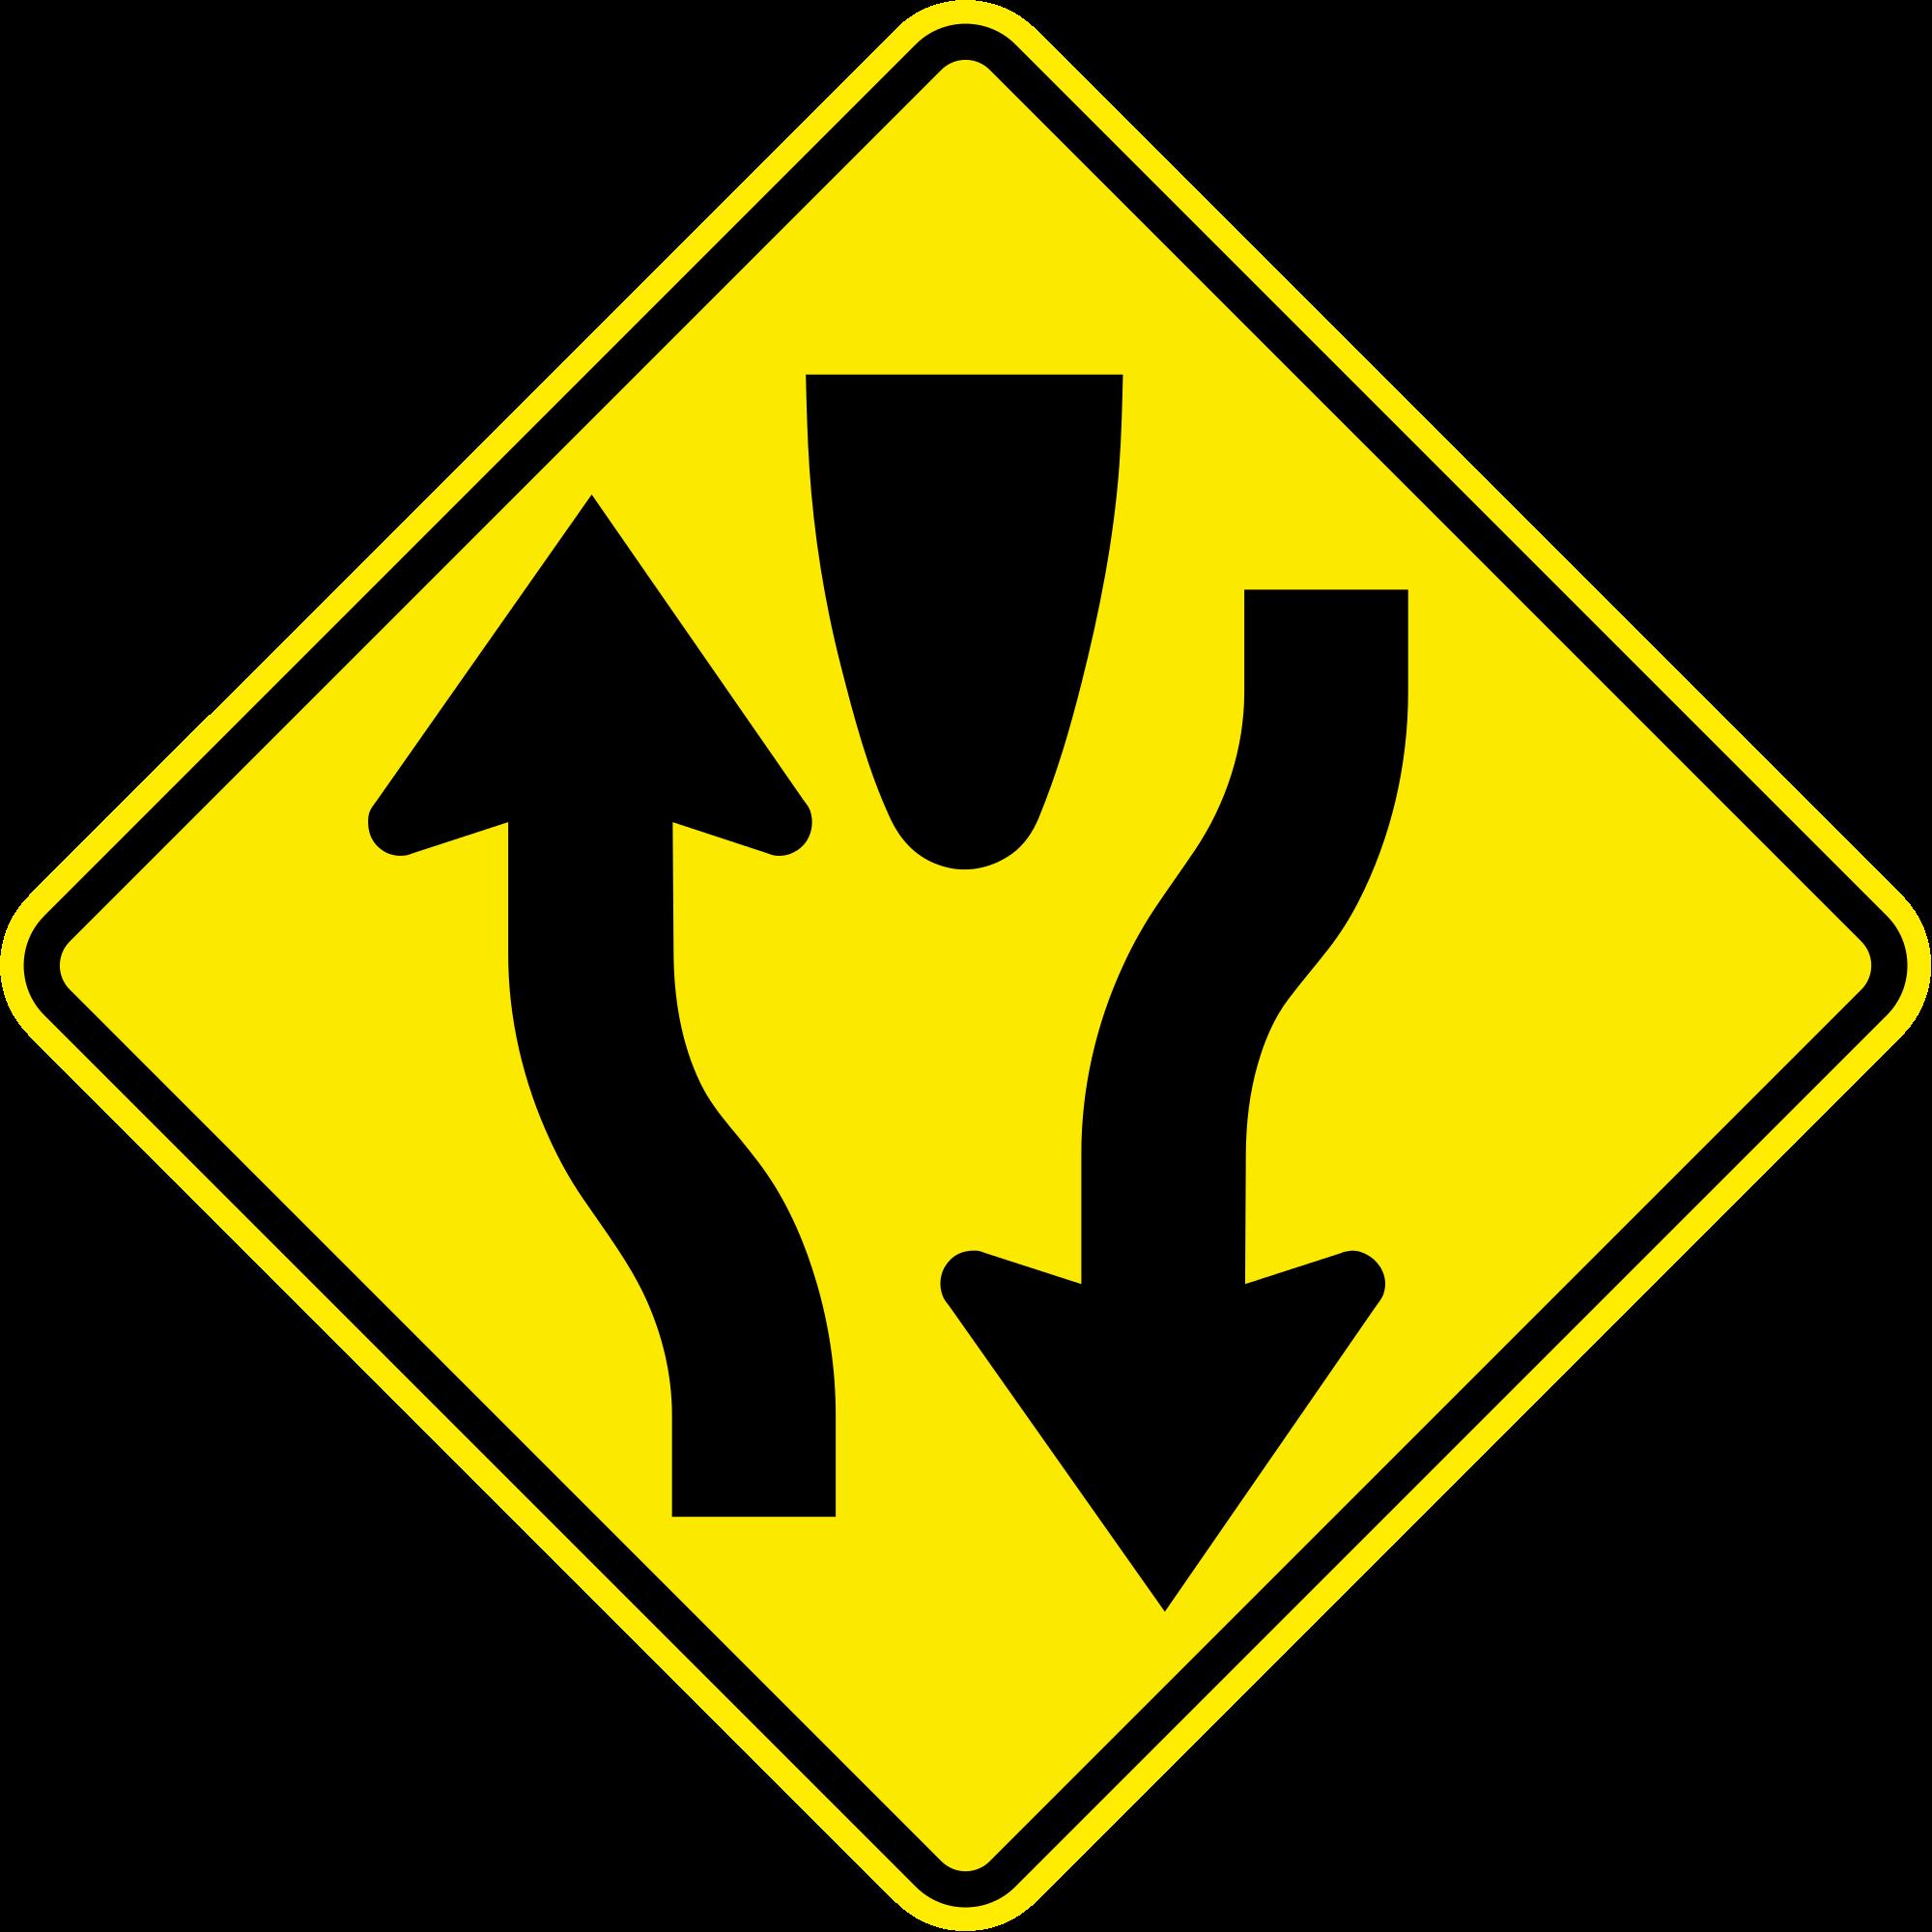 Goals clipart road ahead. File jamaica sign w